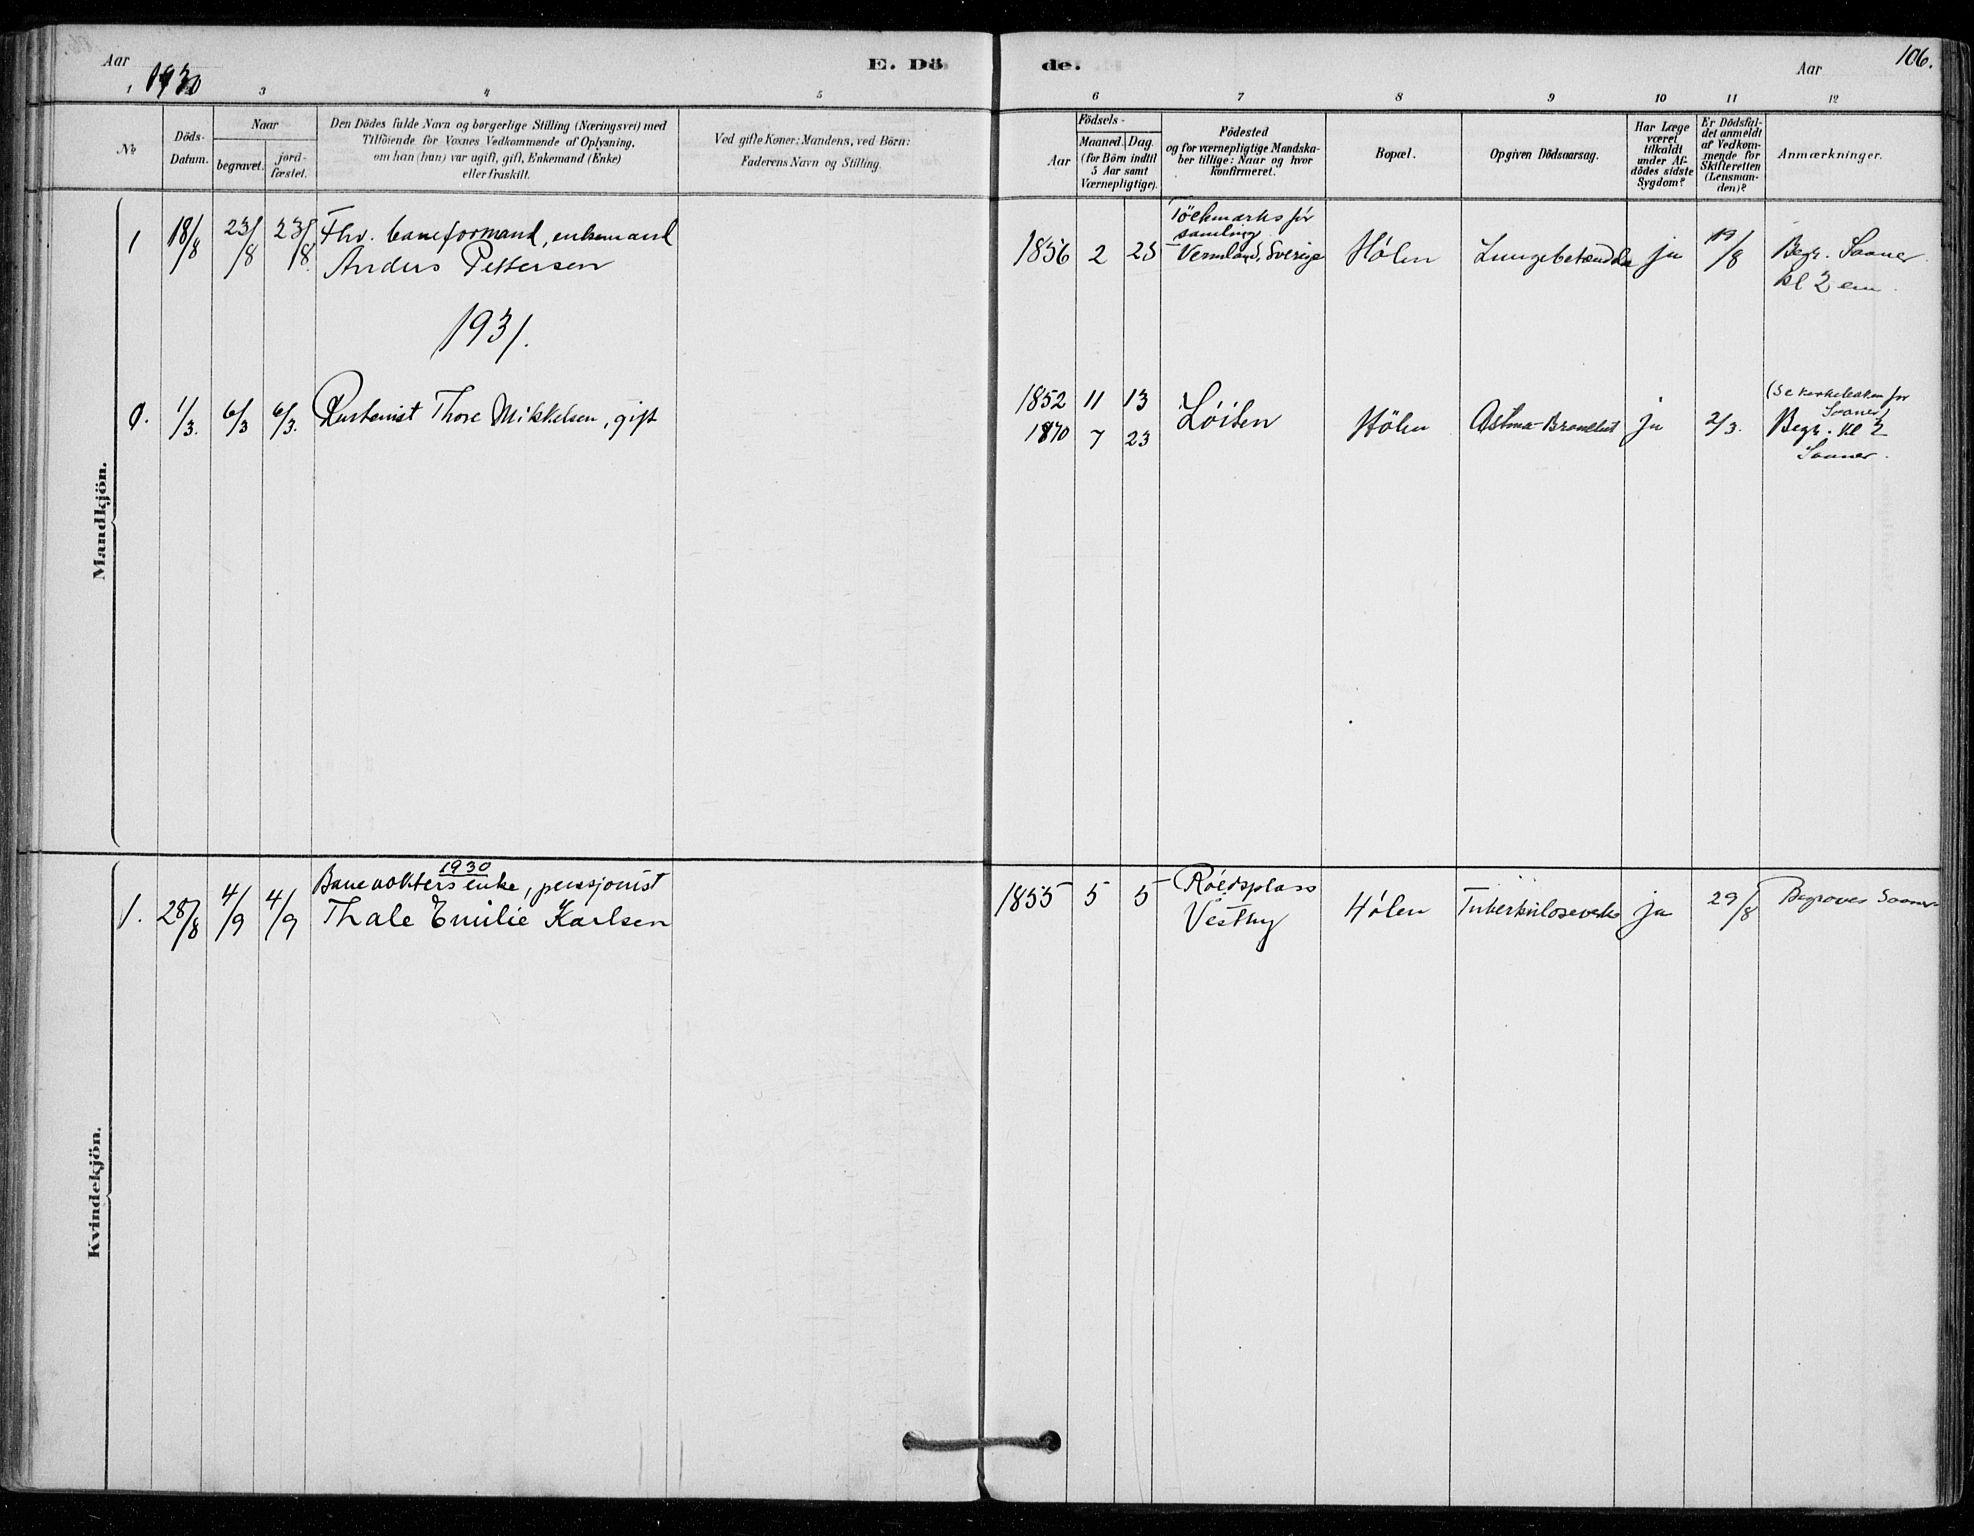 SAO, Vestby prestekontor Kirkebøker, F/Fe/L0001: Ministerialbok nr. V 1, 1878-1931, s. 106